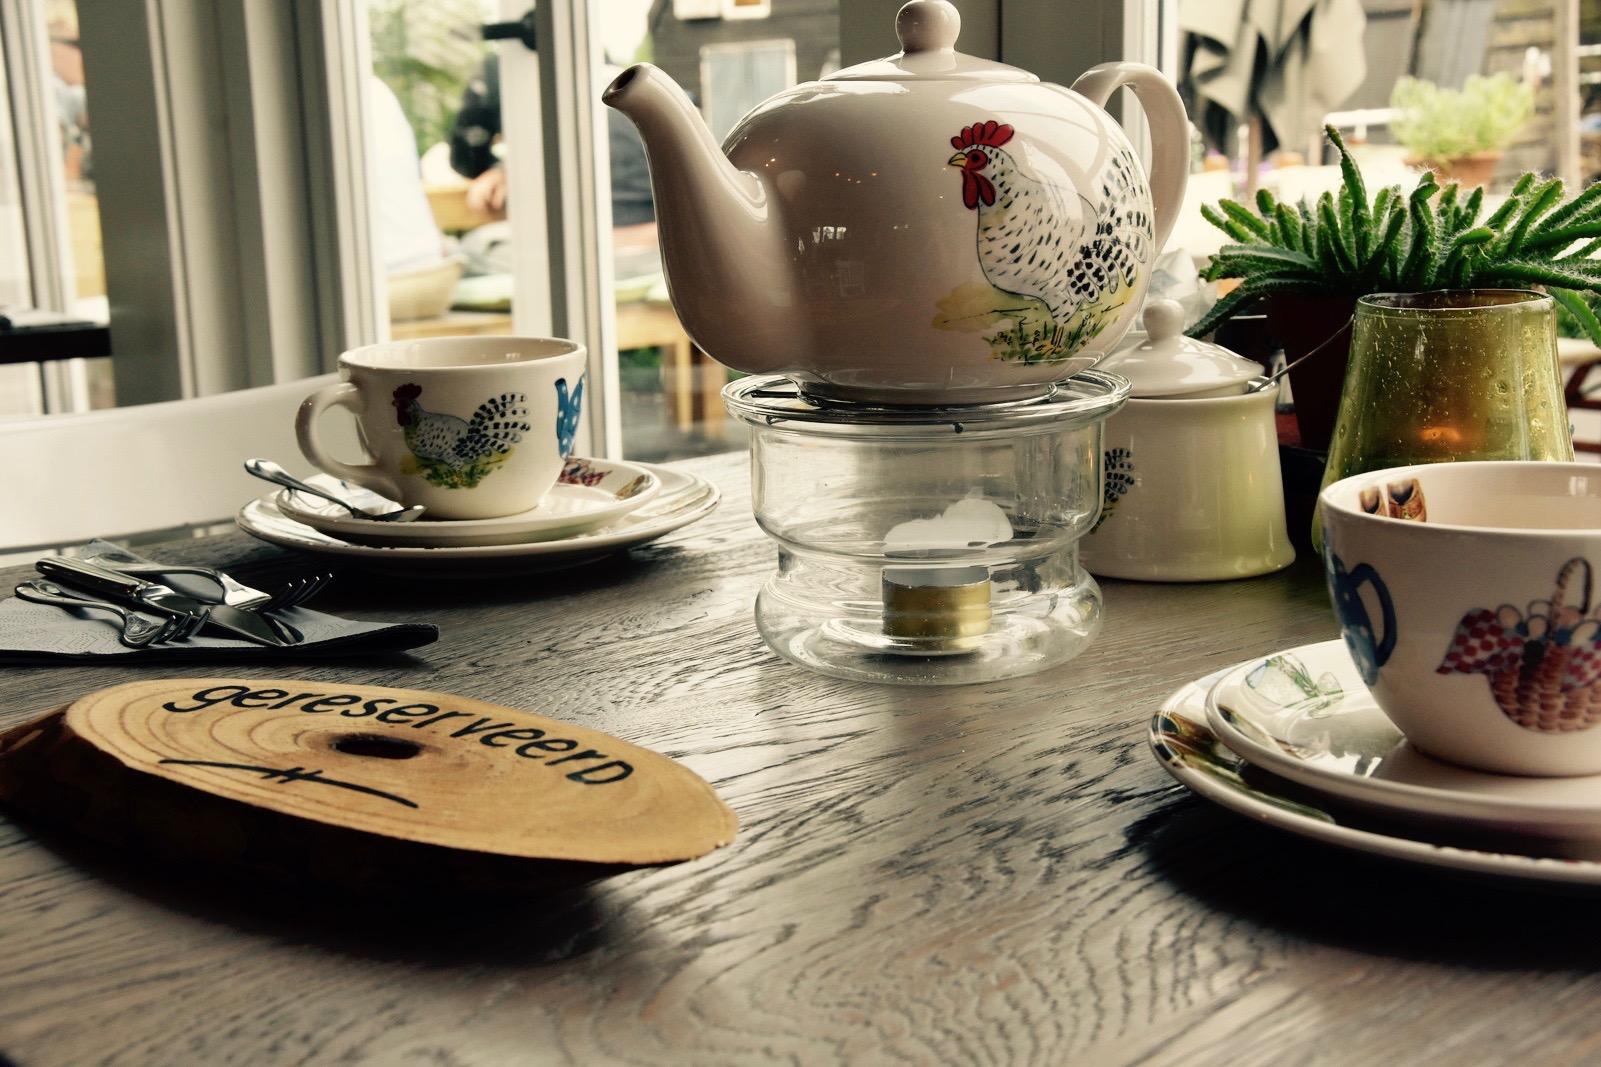 Tuinhuis Aalsmeer, high tea, high tea vriendinnen